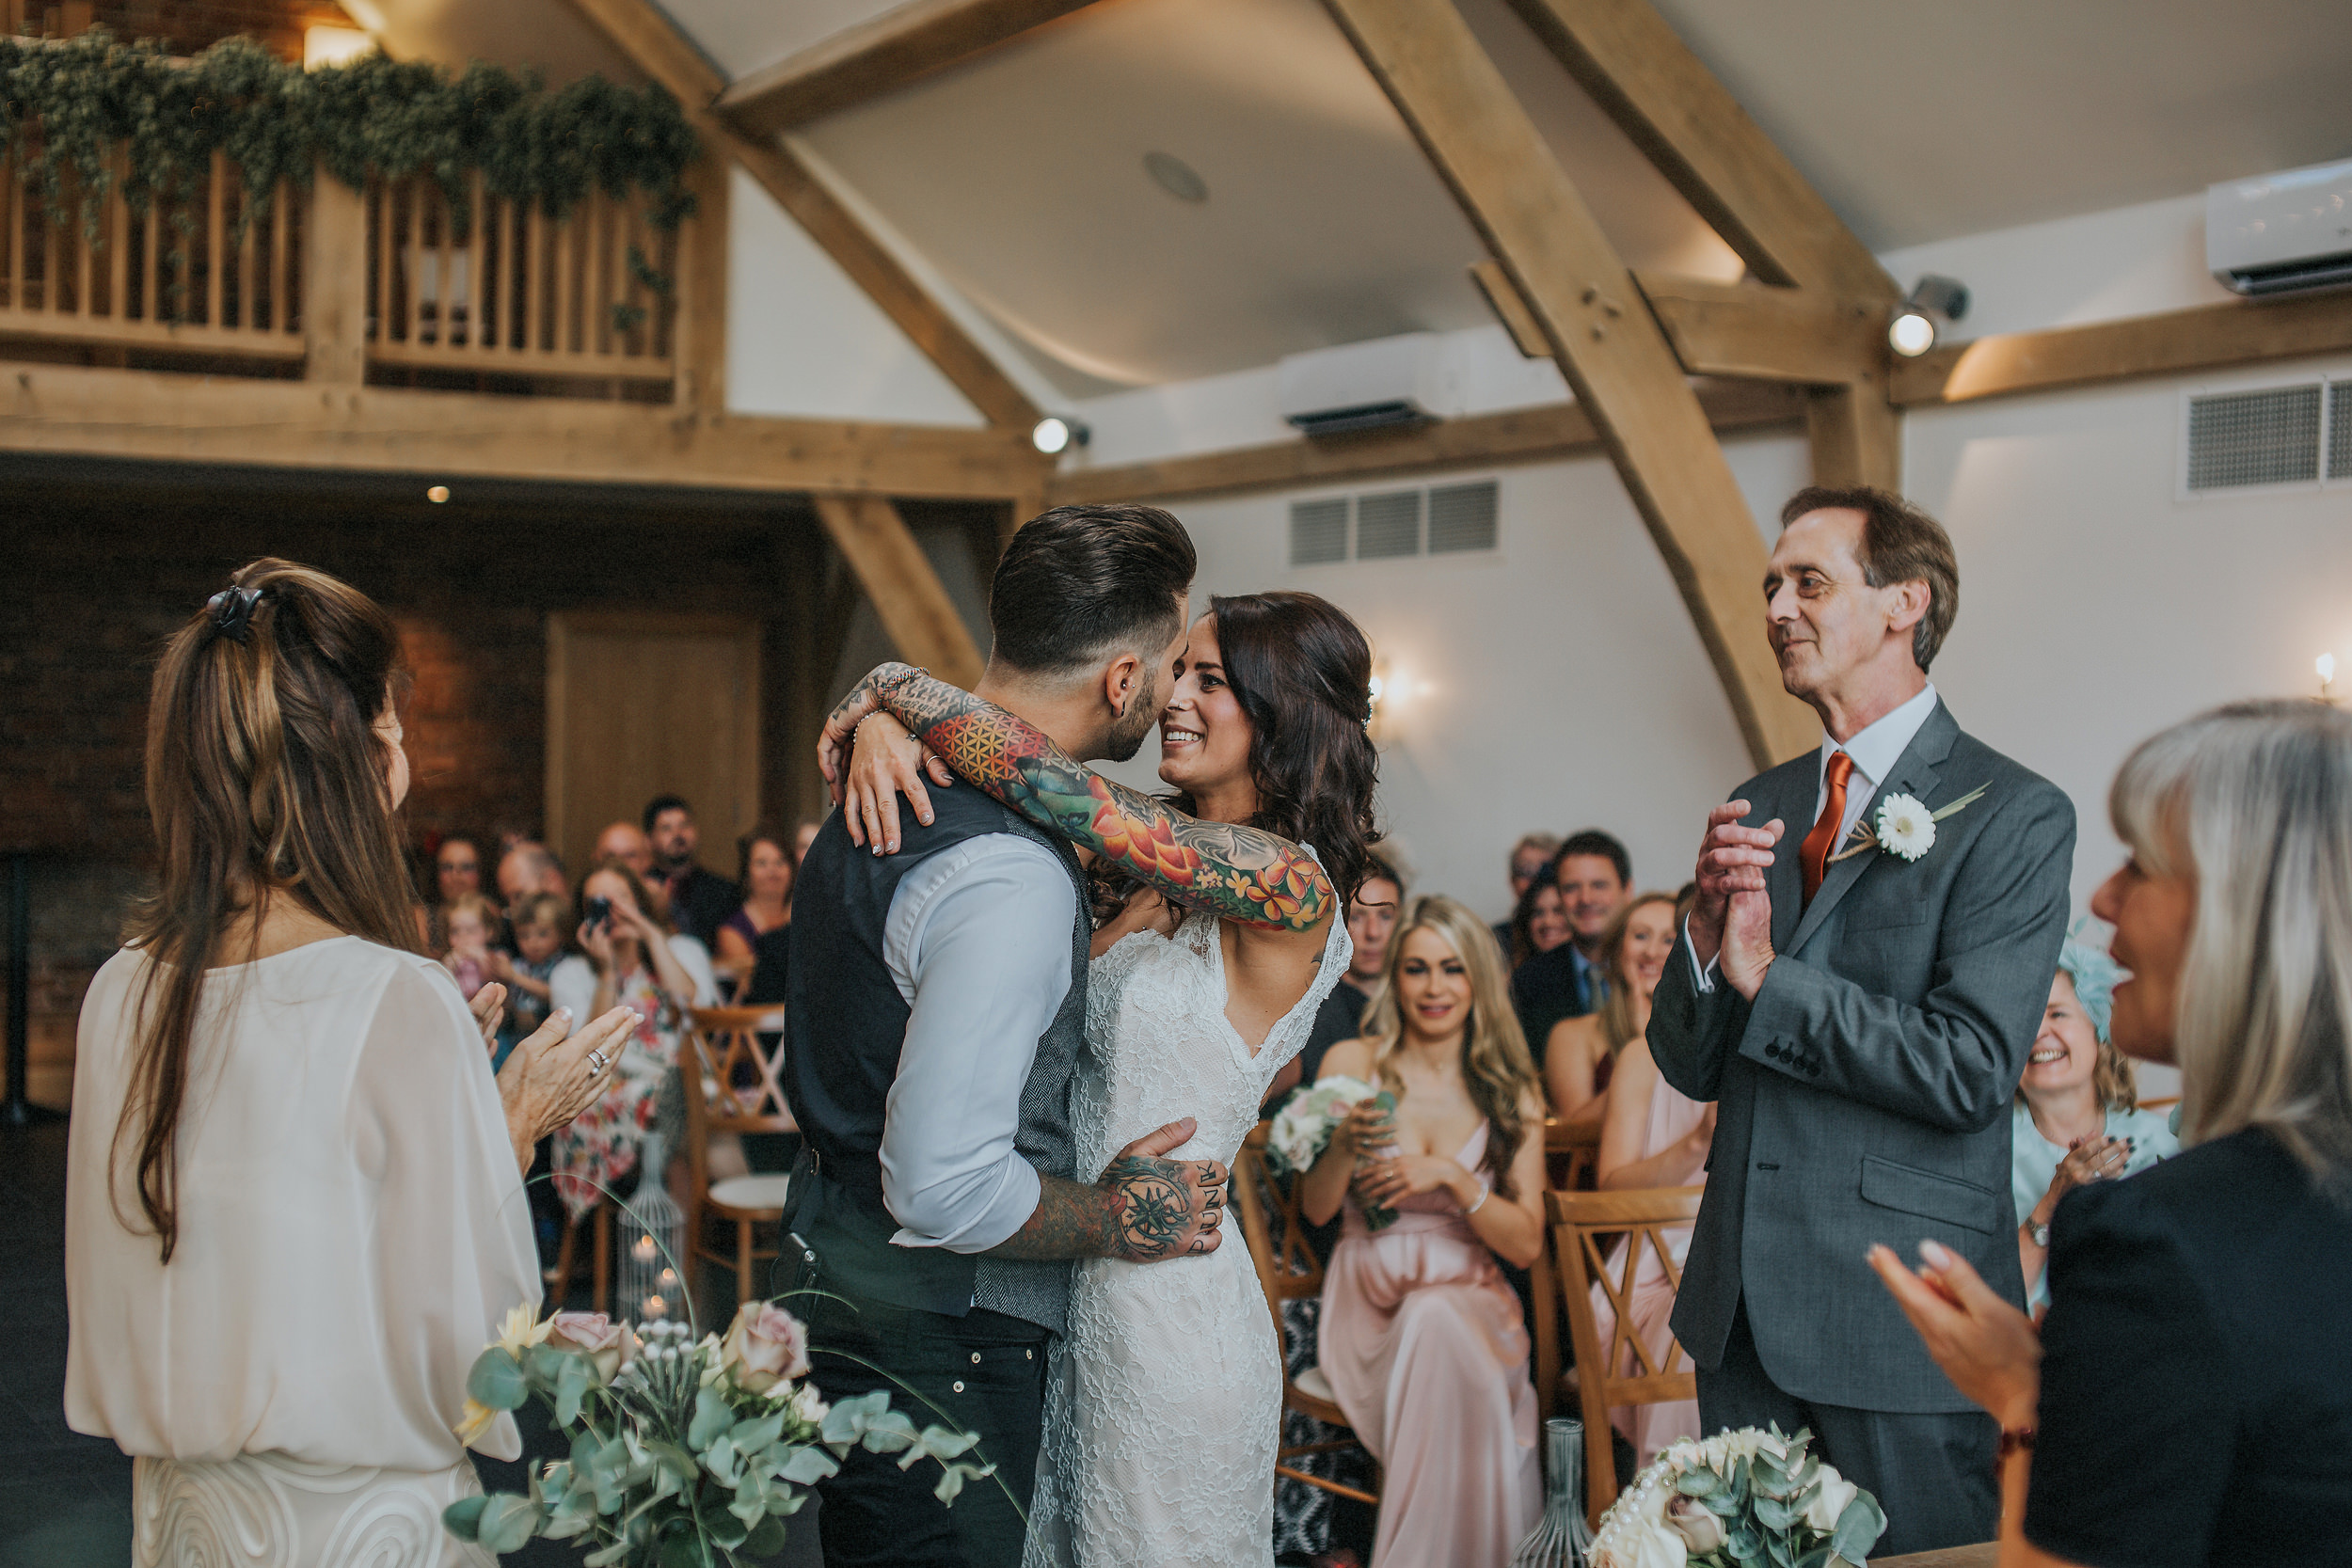 Creative and Alternative wedding photographer in Warwickshire